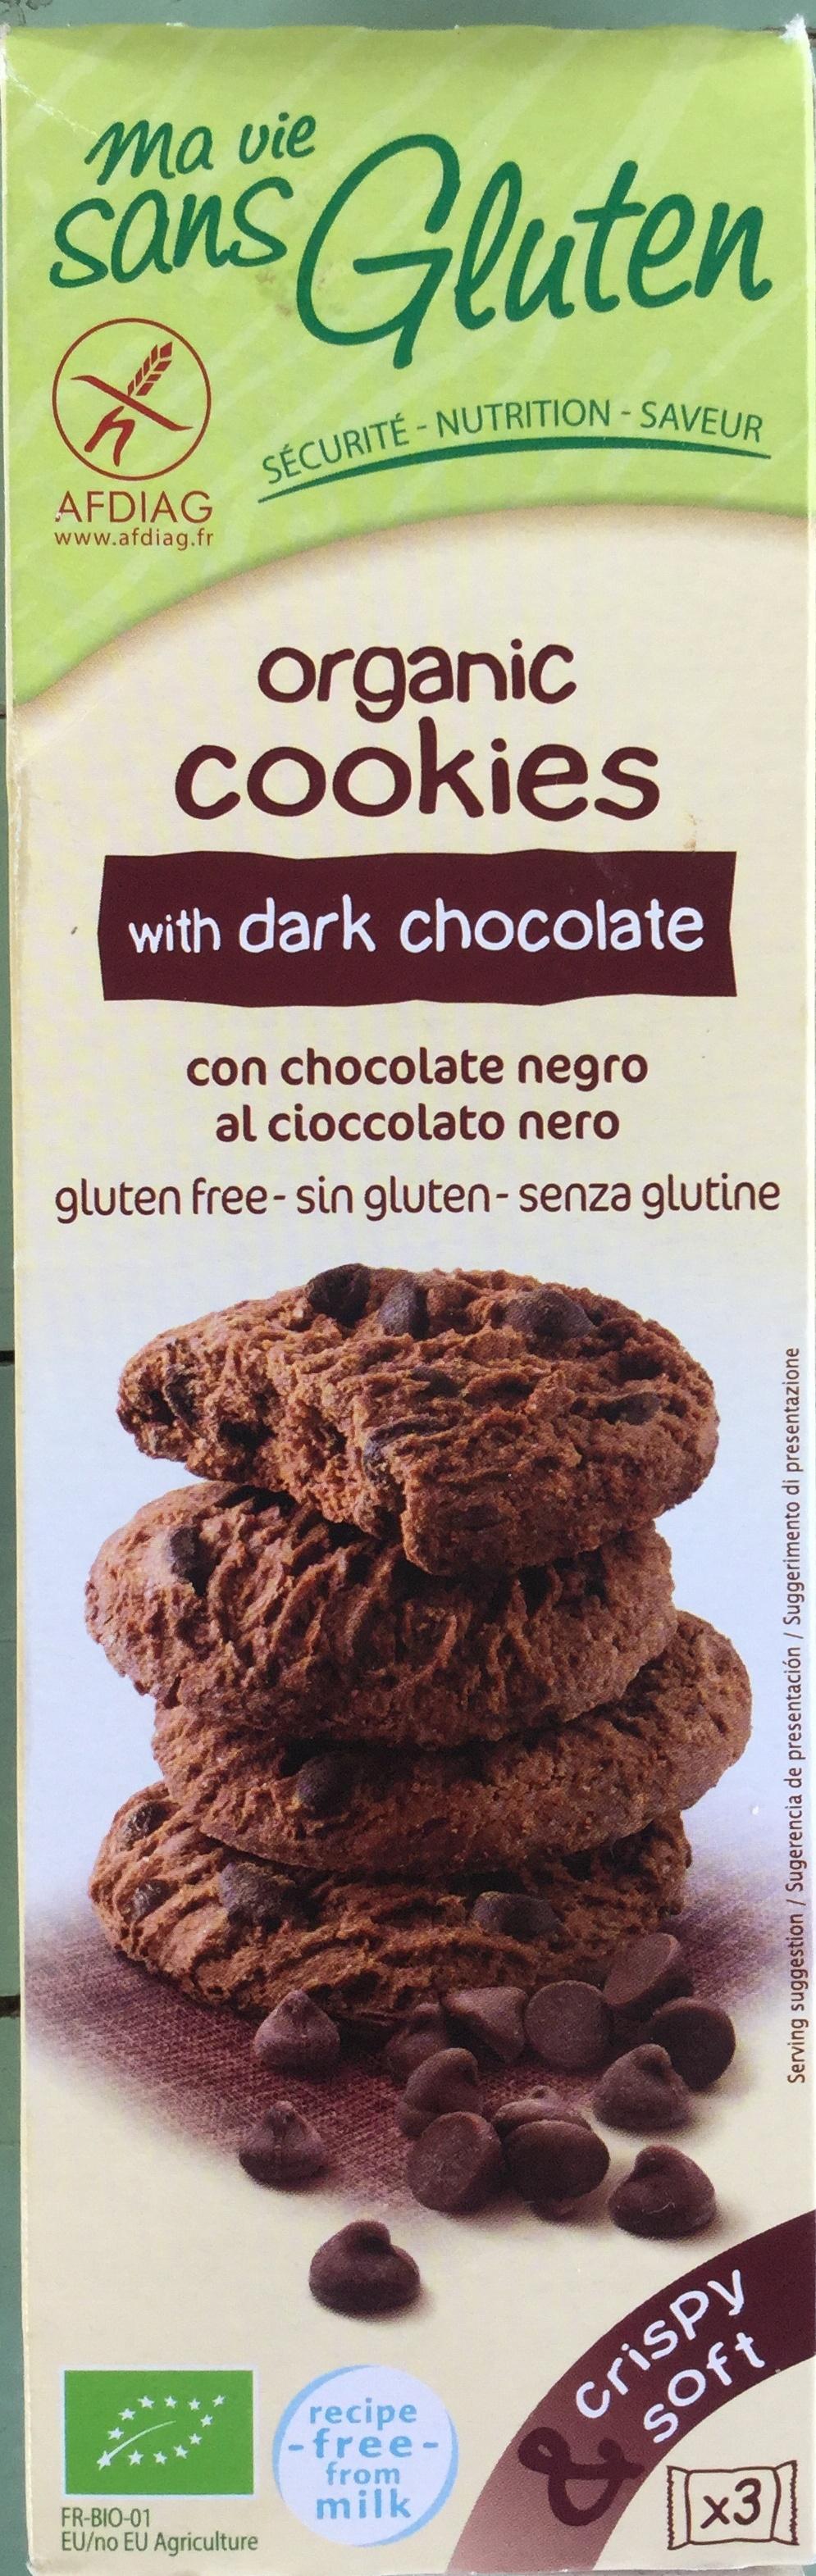 Cookies bio au chocolat noir - Product - en